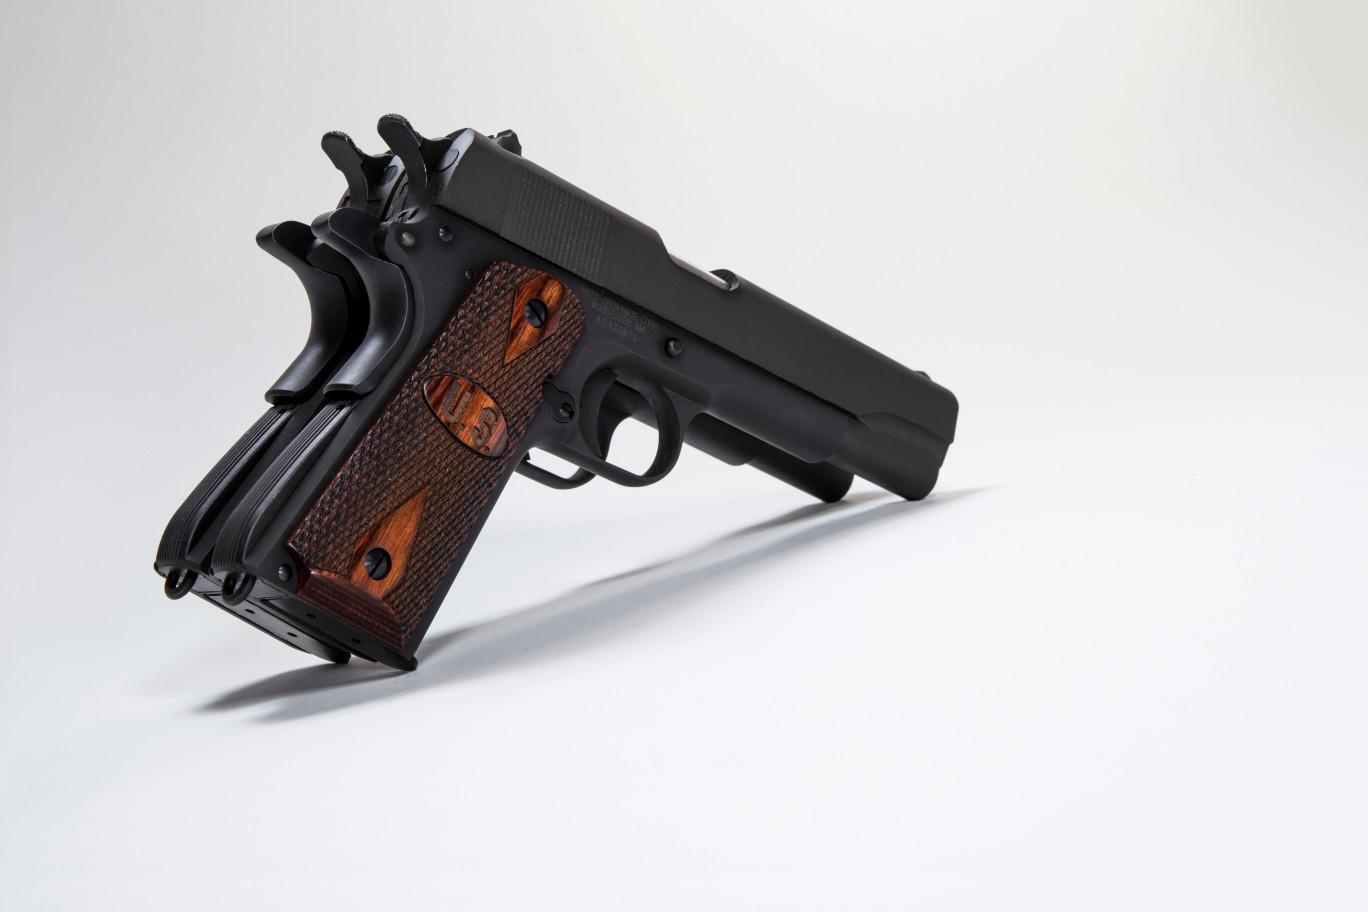 Auto Ordnance 1911 Pistol - Auto-Ordnance | Original